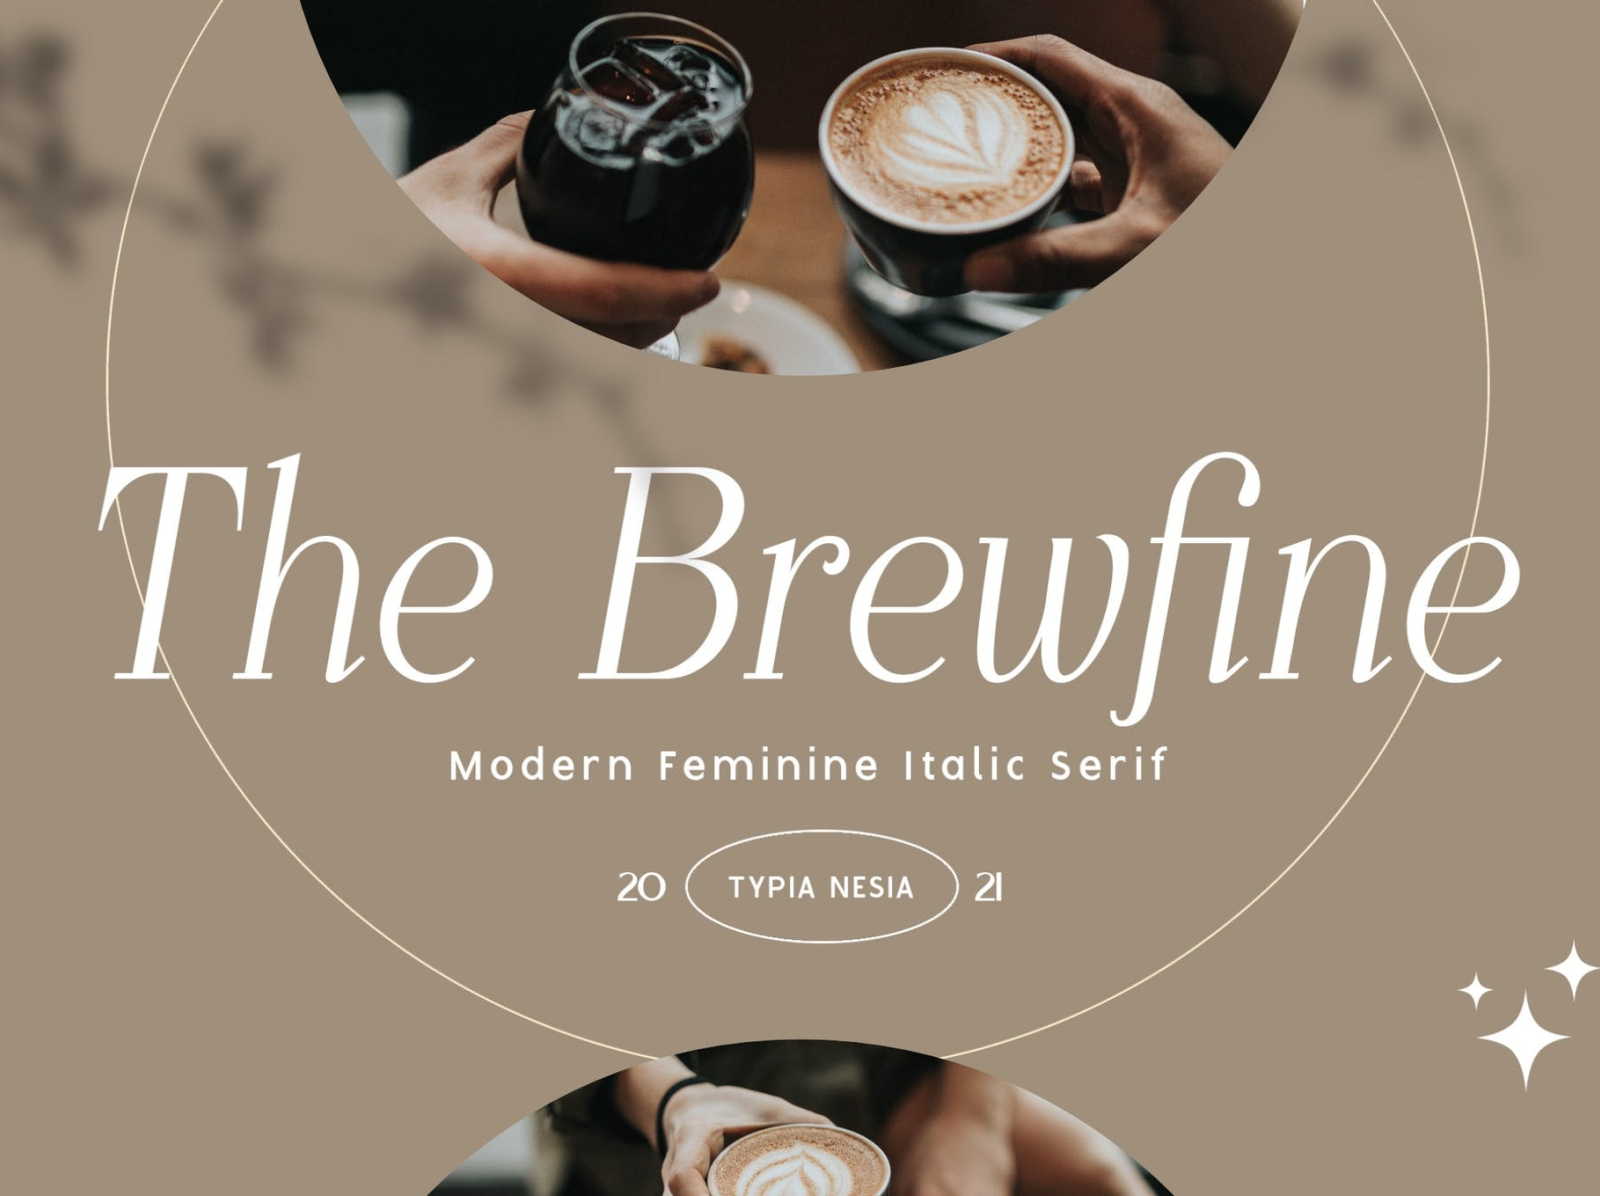 The Brewfine - modern feminine italic serif font typeface font modern architecture magazine logofont feminine classy luxury coffee app ux vector ui typography logo graphic design illustration design branding